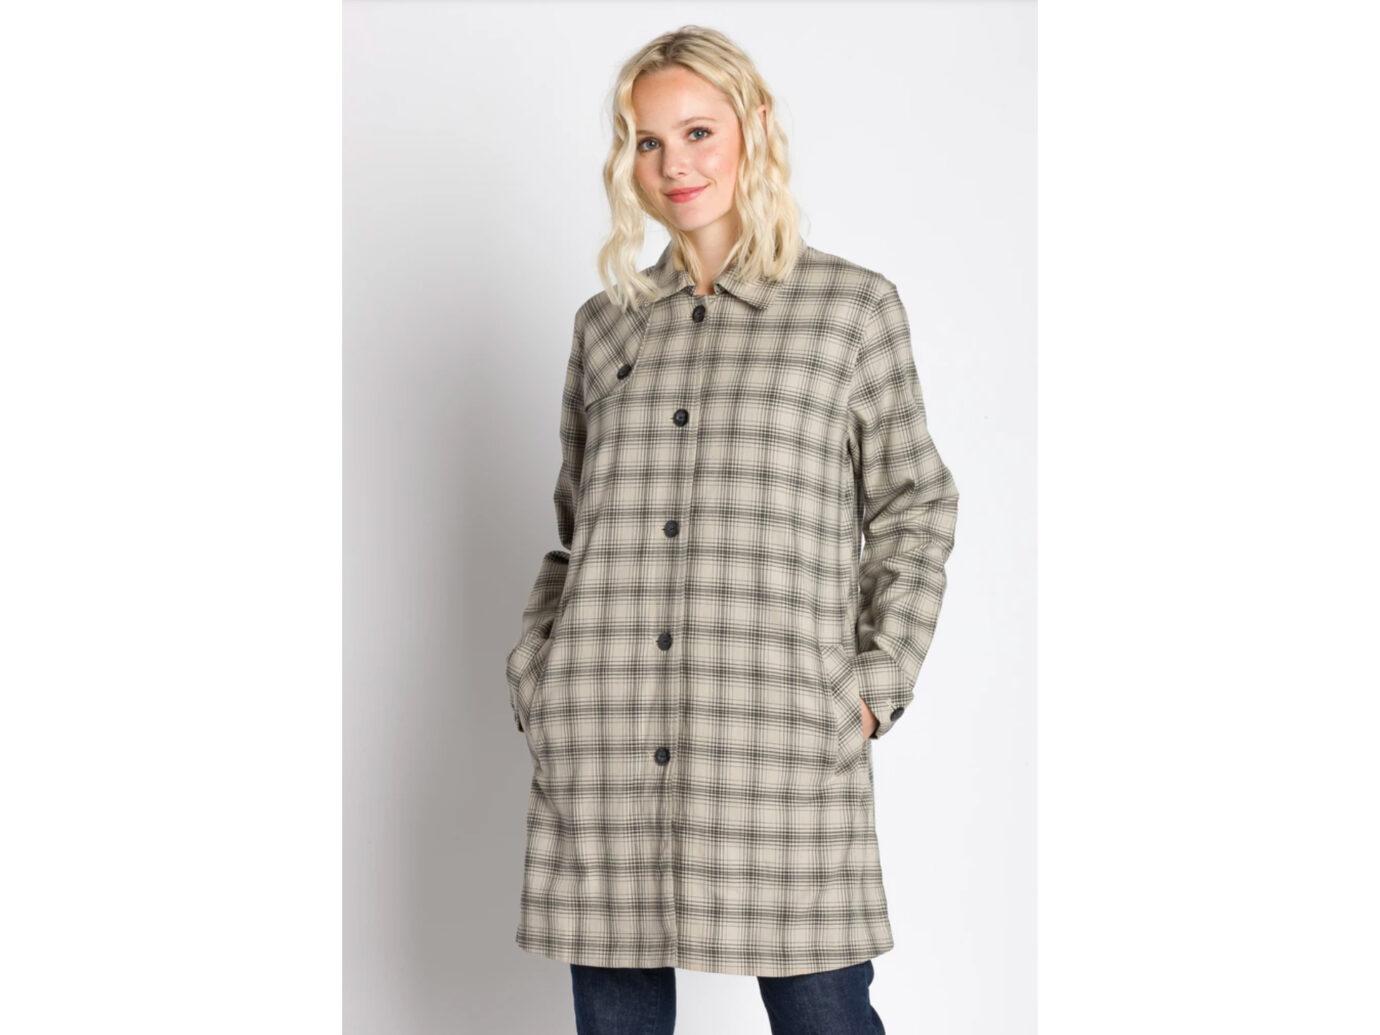 Darby | Women's Long Sleeve Packable Raincoat